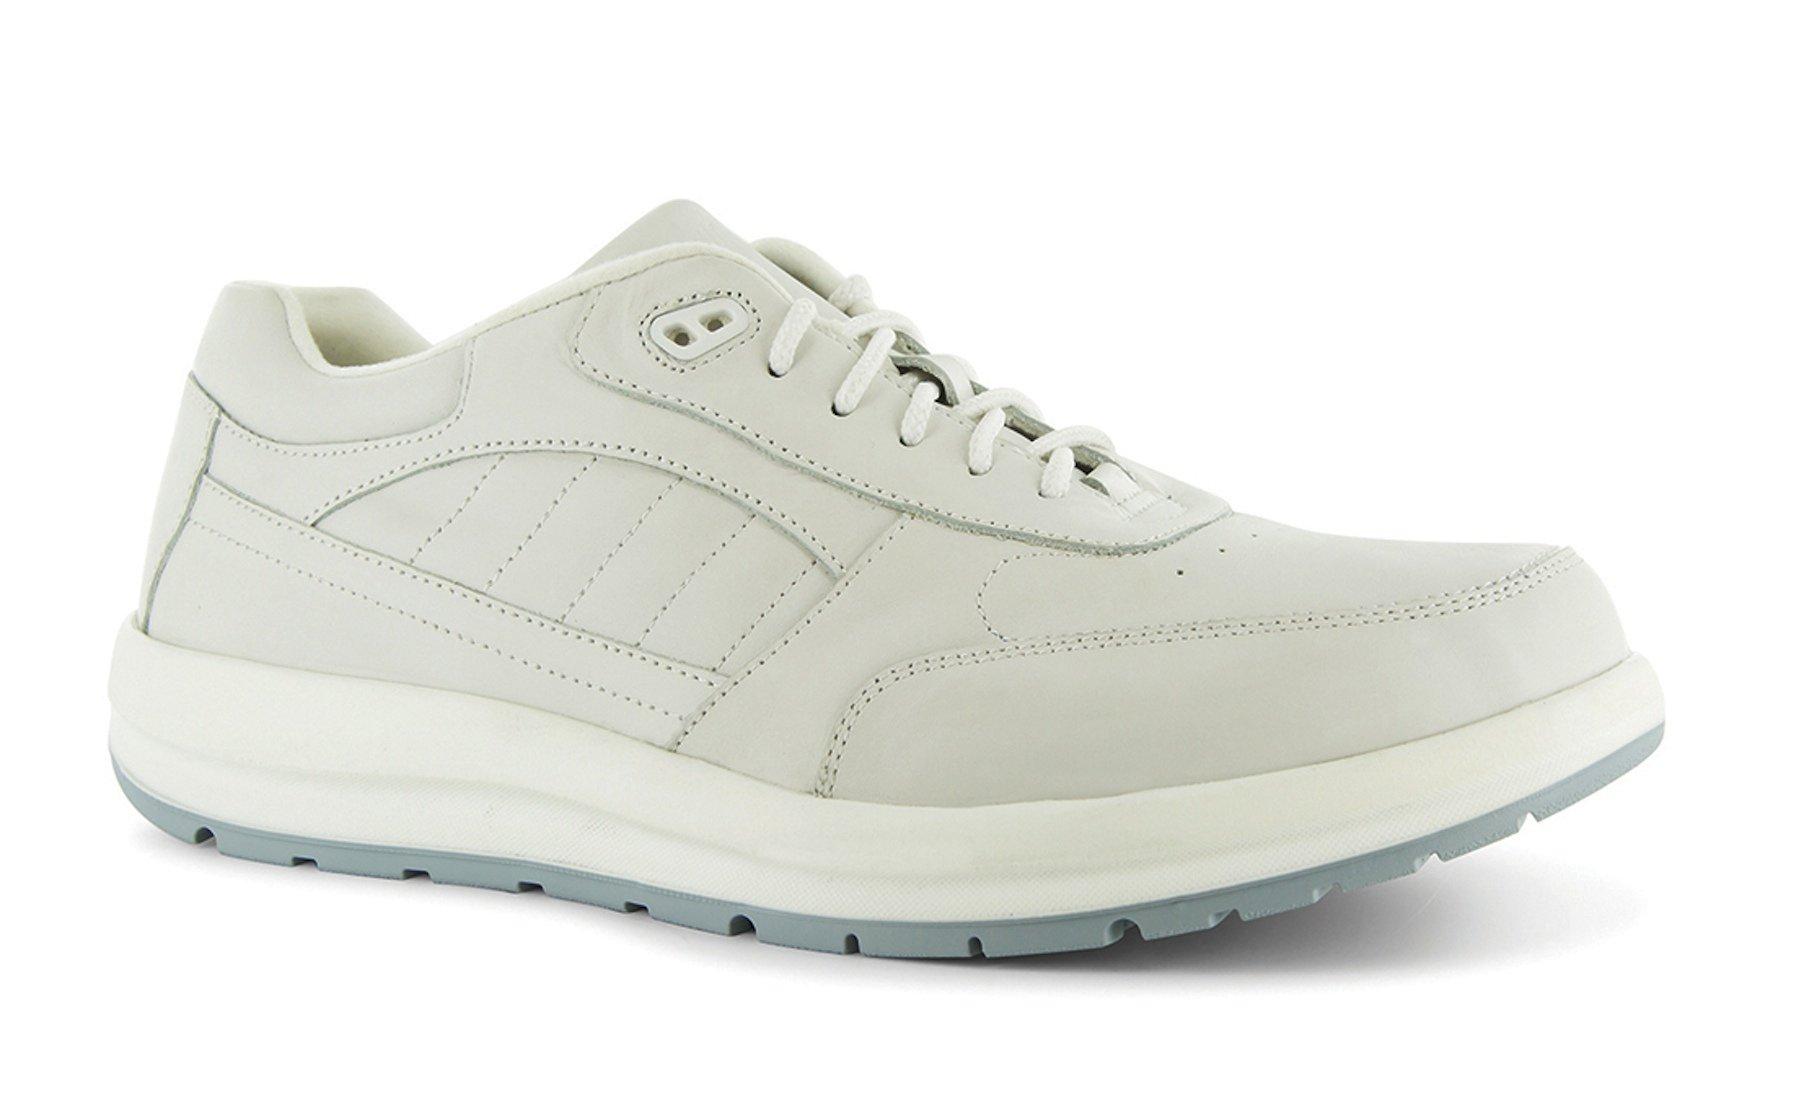 P W Minor Performance Walker Men's Therapeutic Casual Extra Depth Shoe: White 12.5 Medium (D) Lace